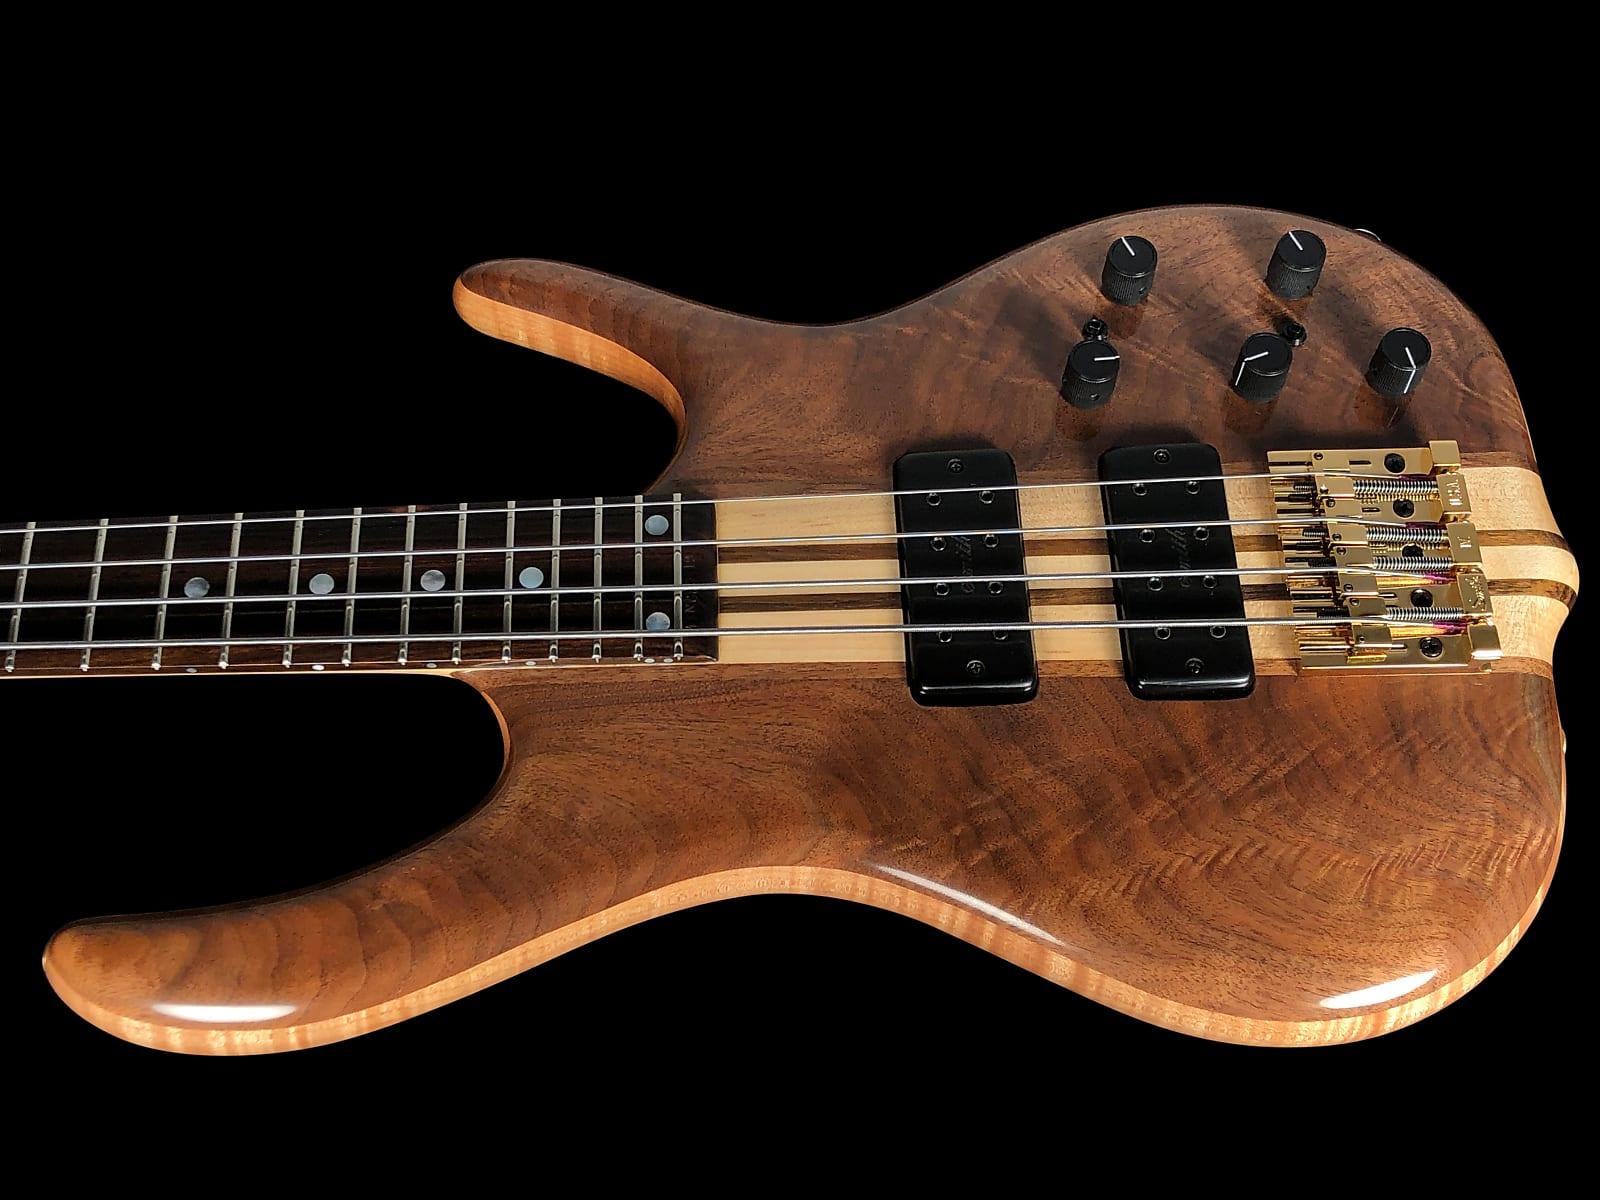 2019 Ken Smith 4TN Black Tiger Figured Walnut BSR 4-String Bass w/ 18v Preamp & Neck-Thru